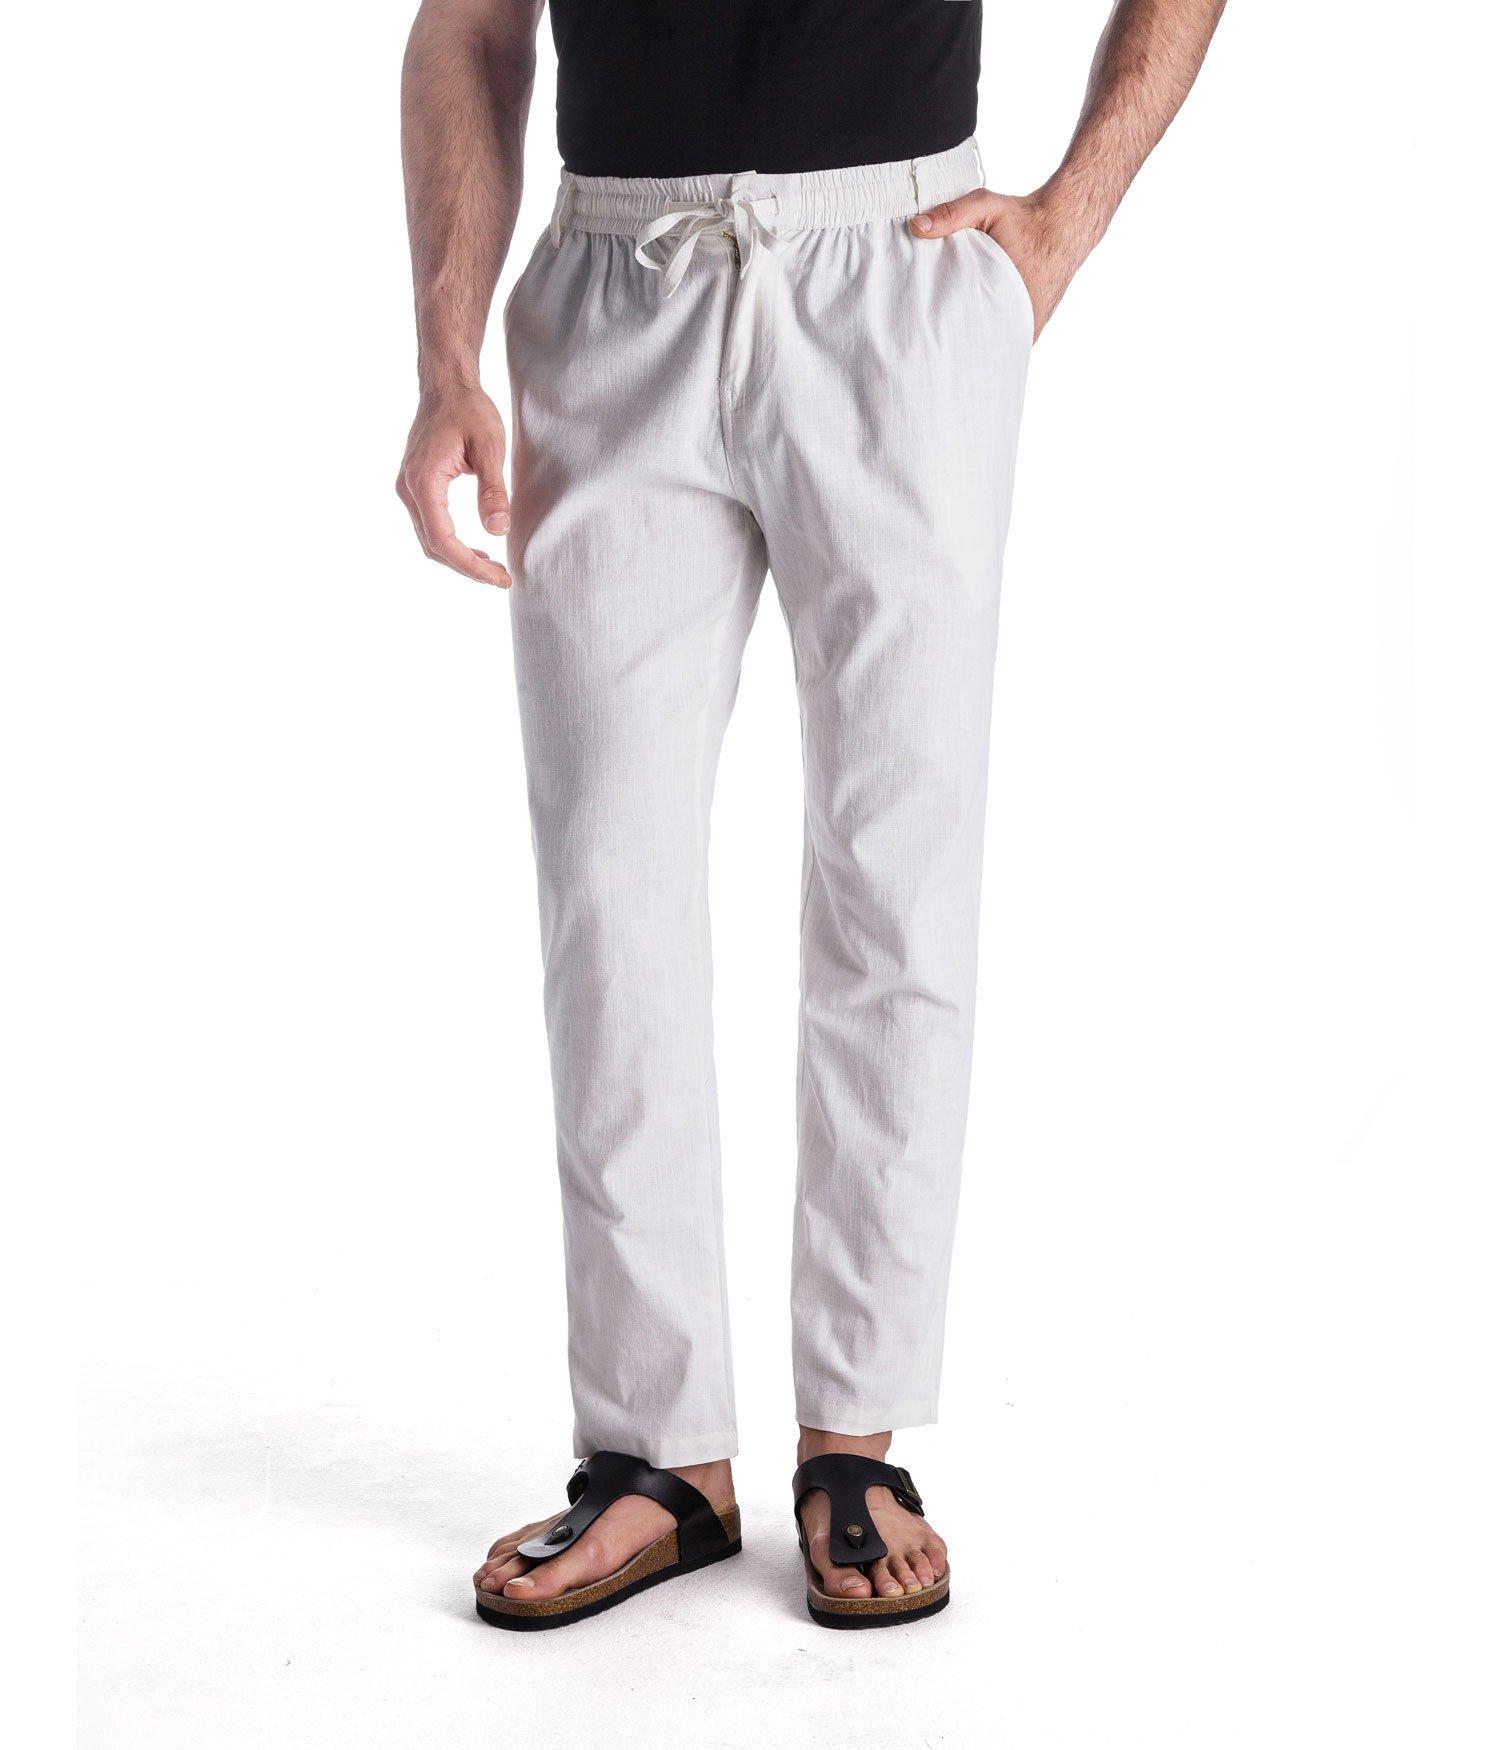 MUSE FATH Men's Linen Drawstring Casual Beach Pants-Lightweight Summer Trousers-White-M